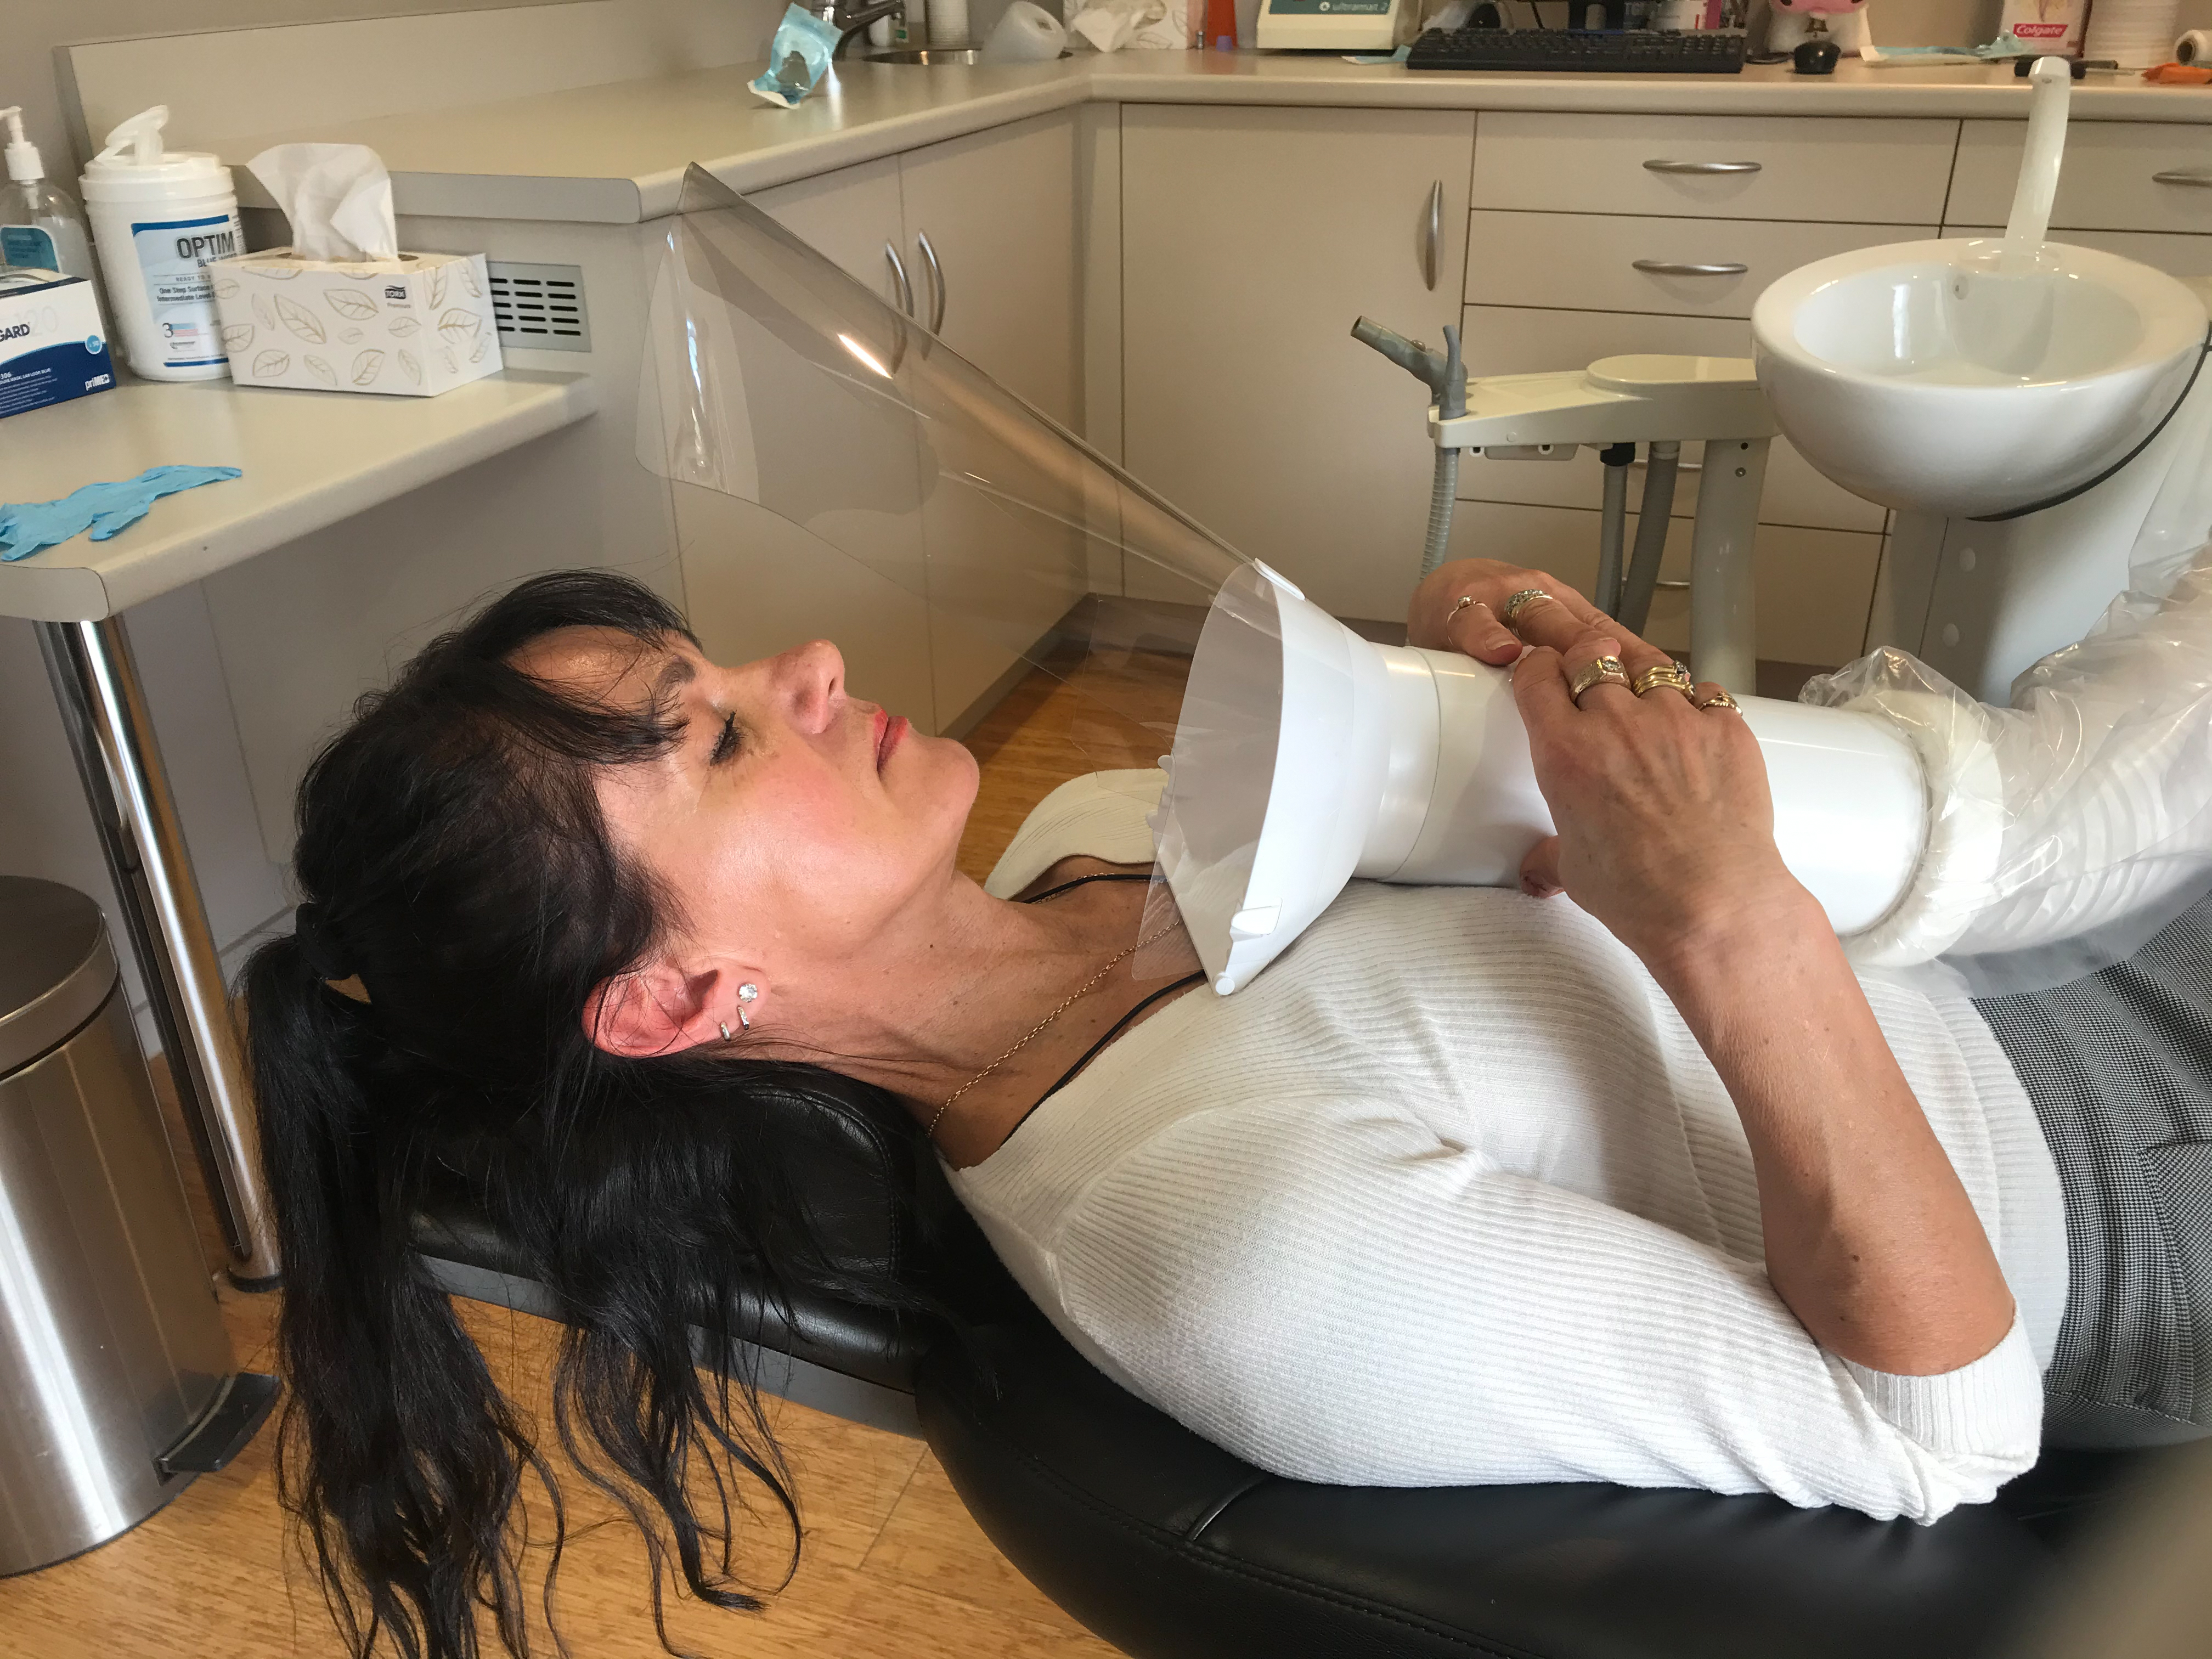 The Rhondair Patient Grip